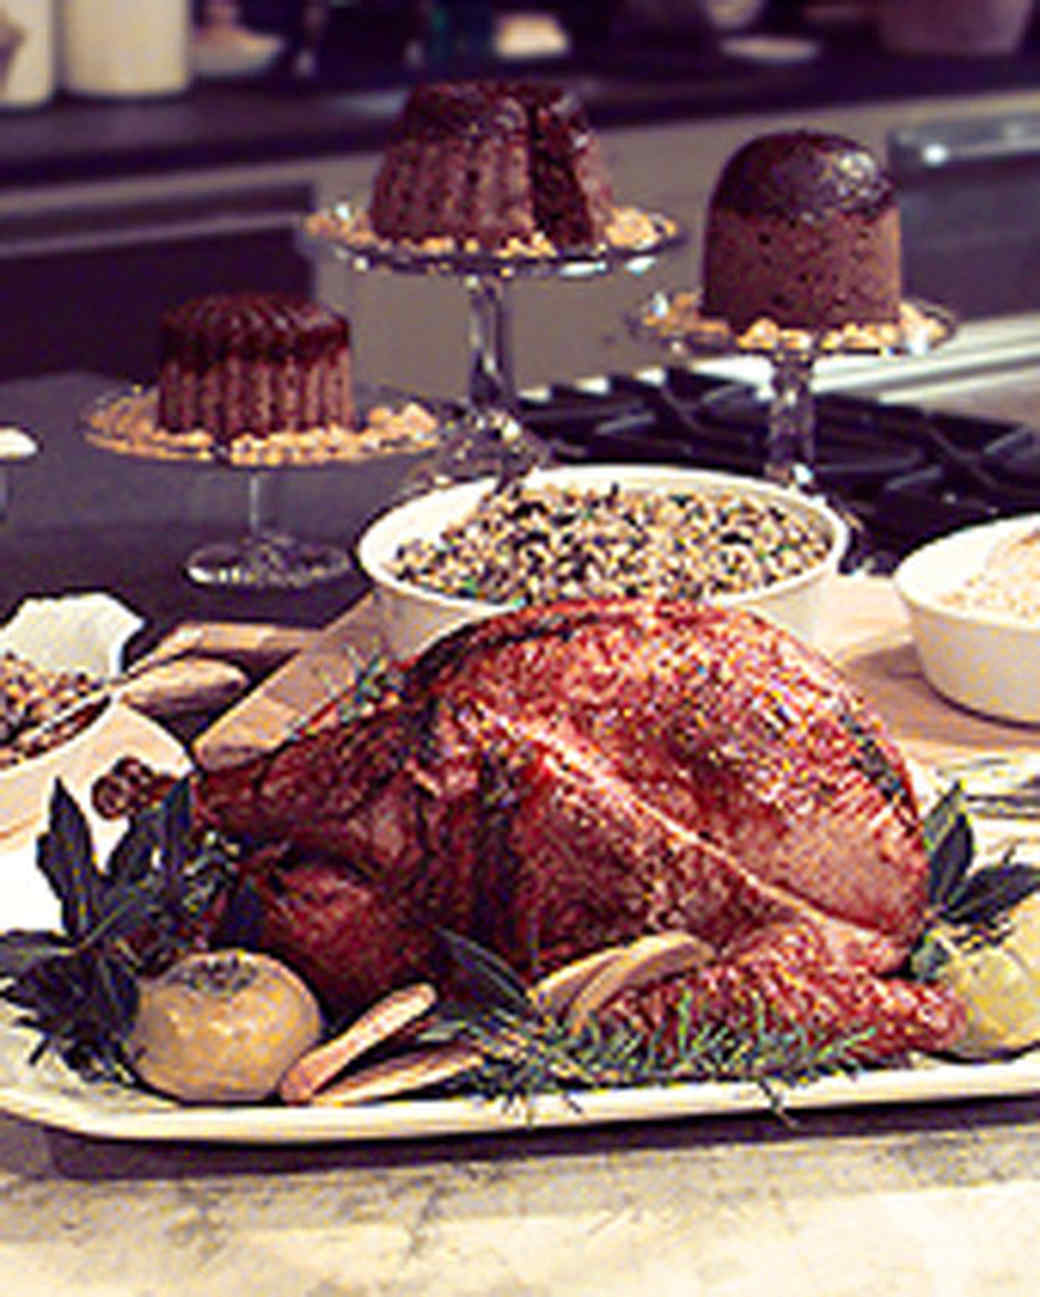 Rotisserie Turkey on the Grill